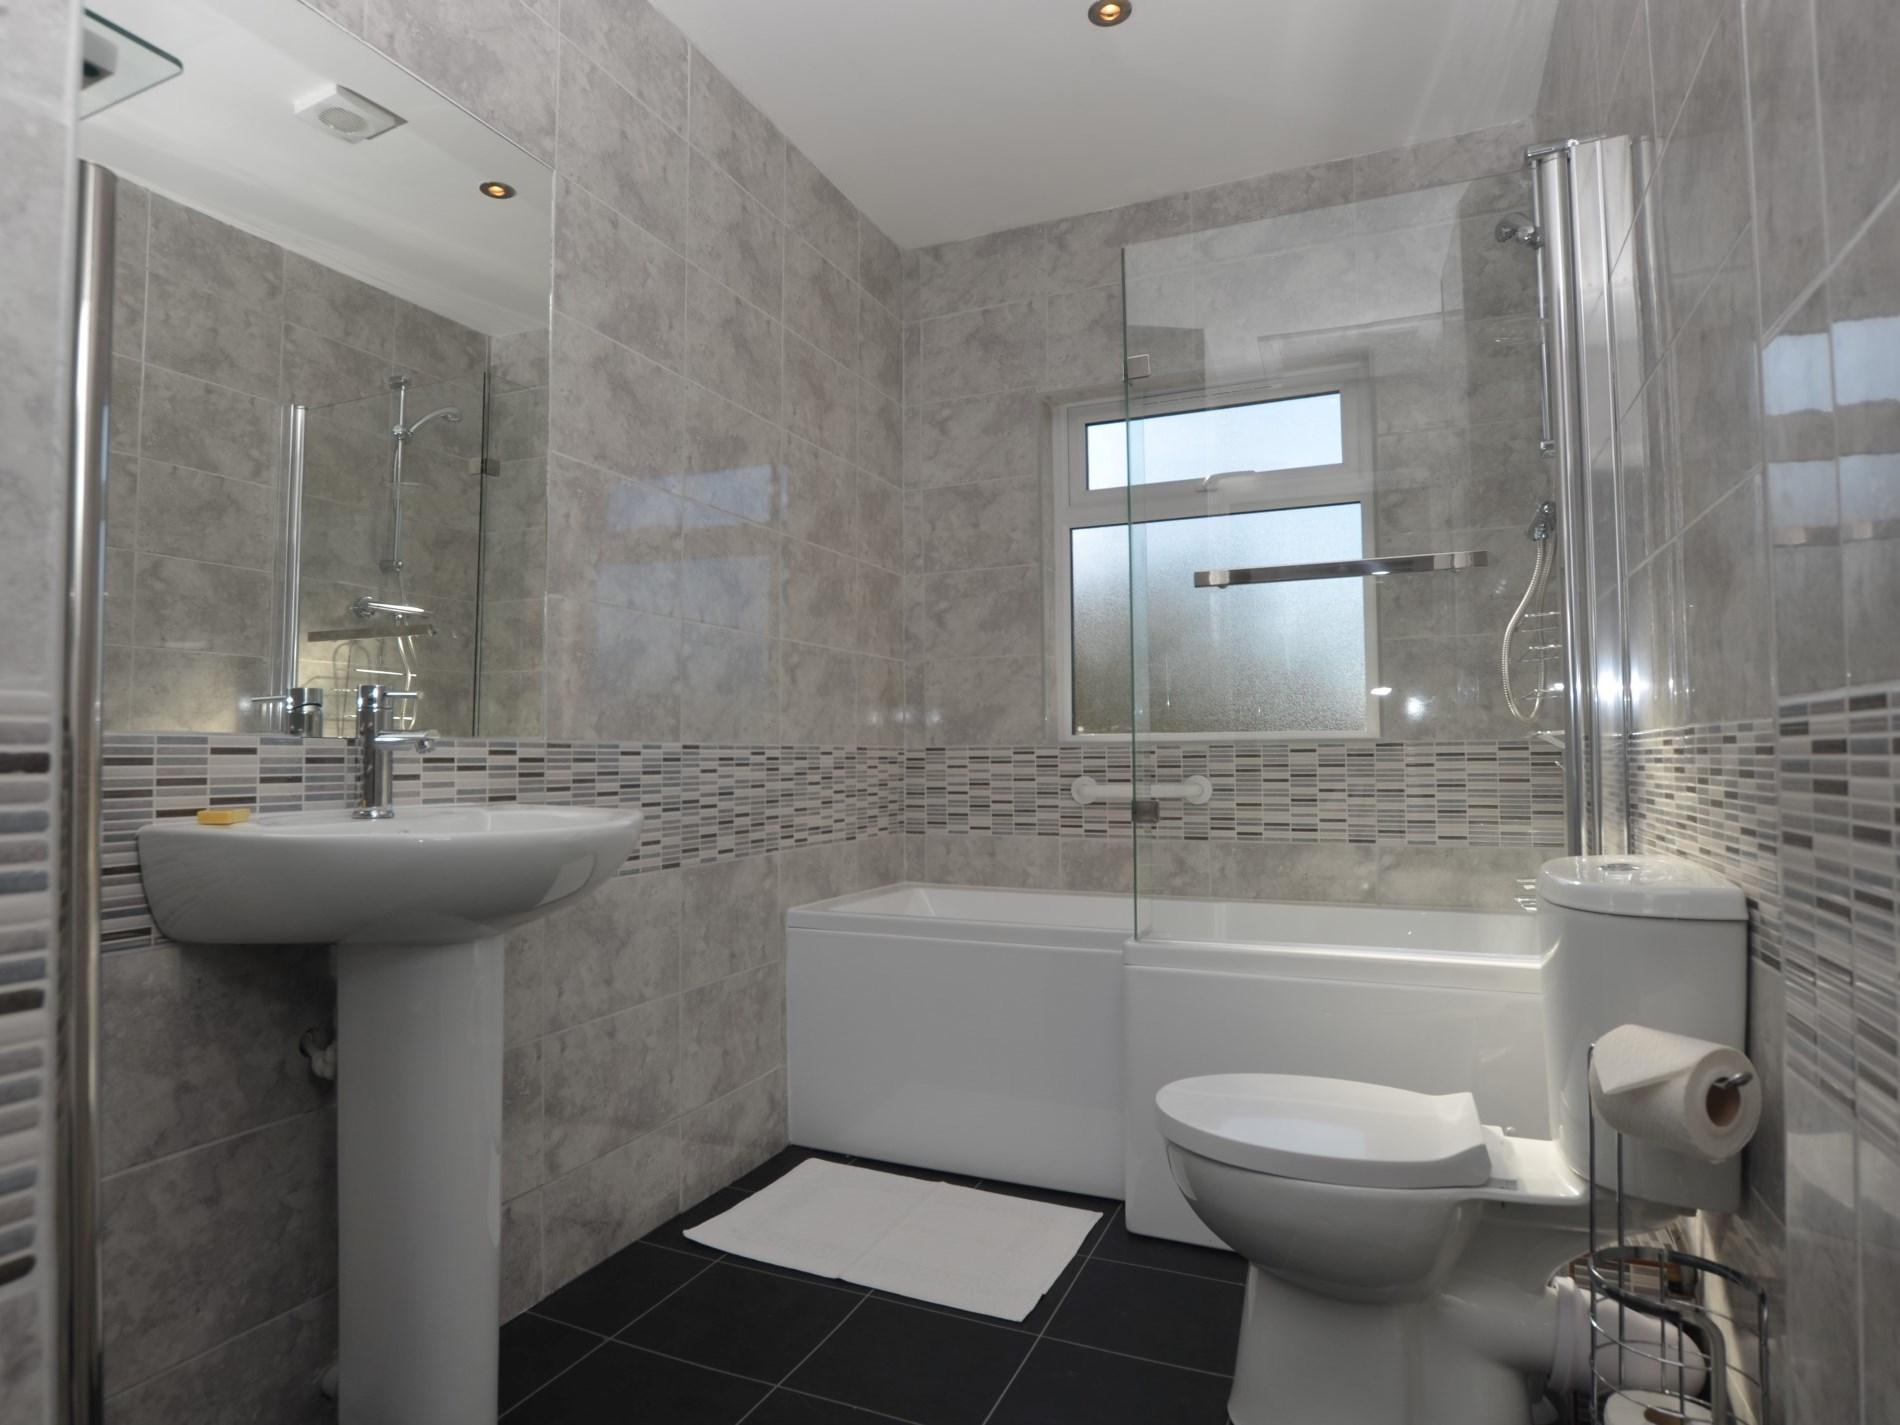 Spacious en-suite bathroom